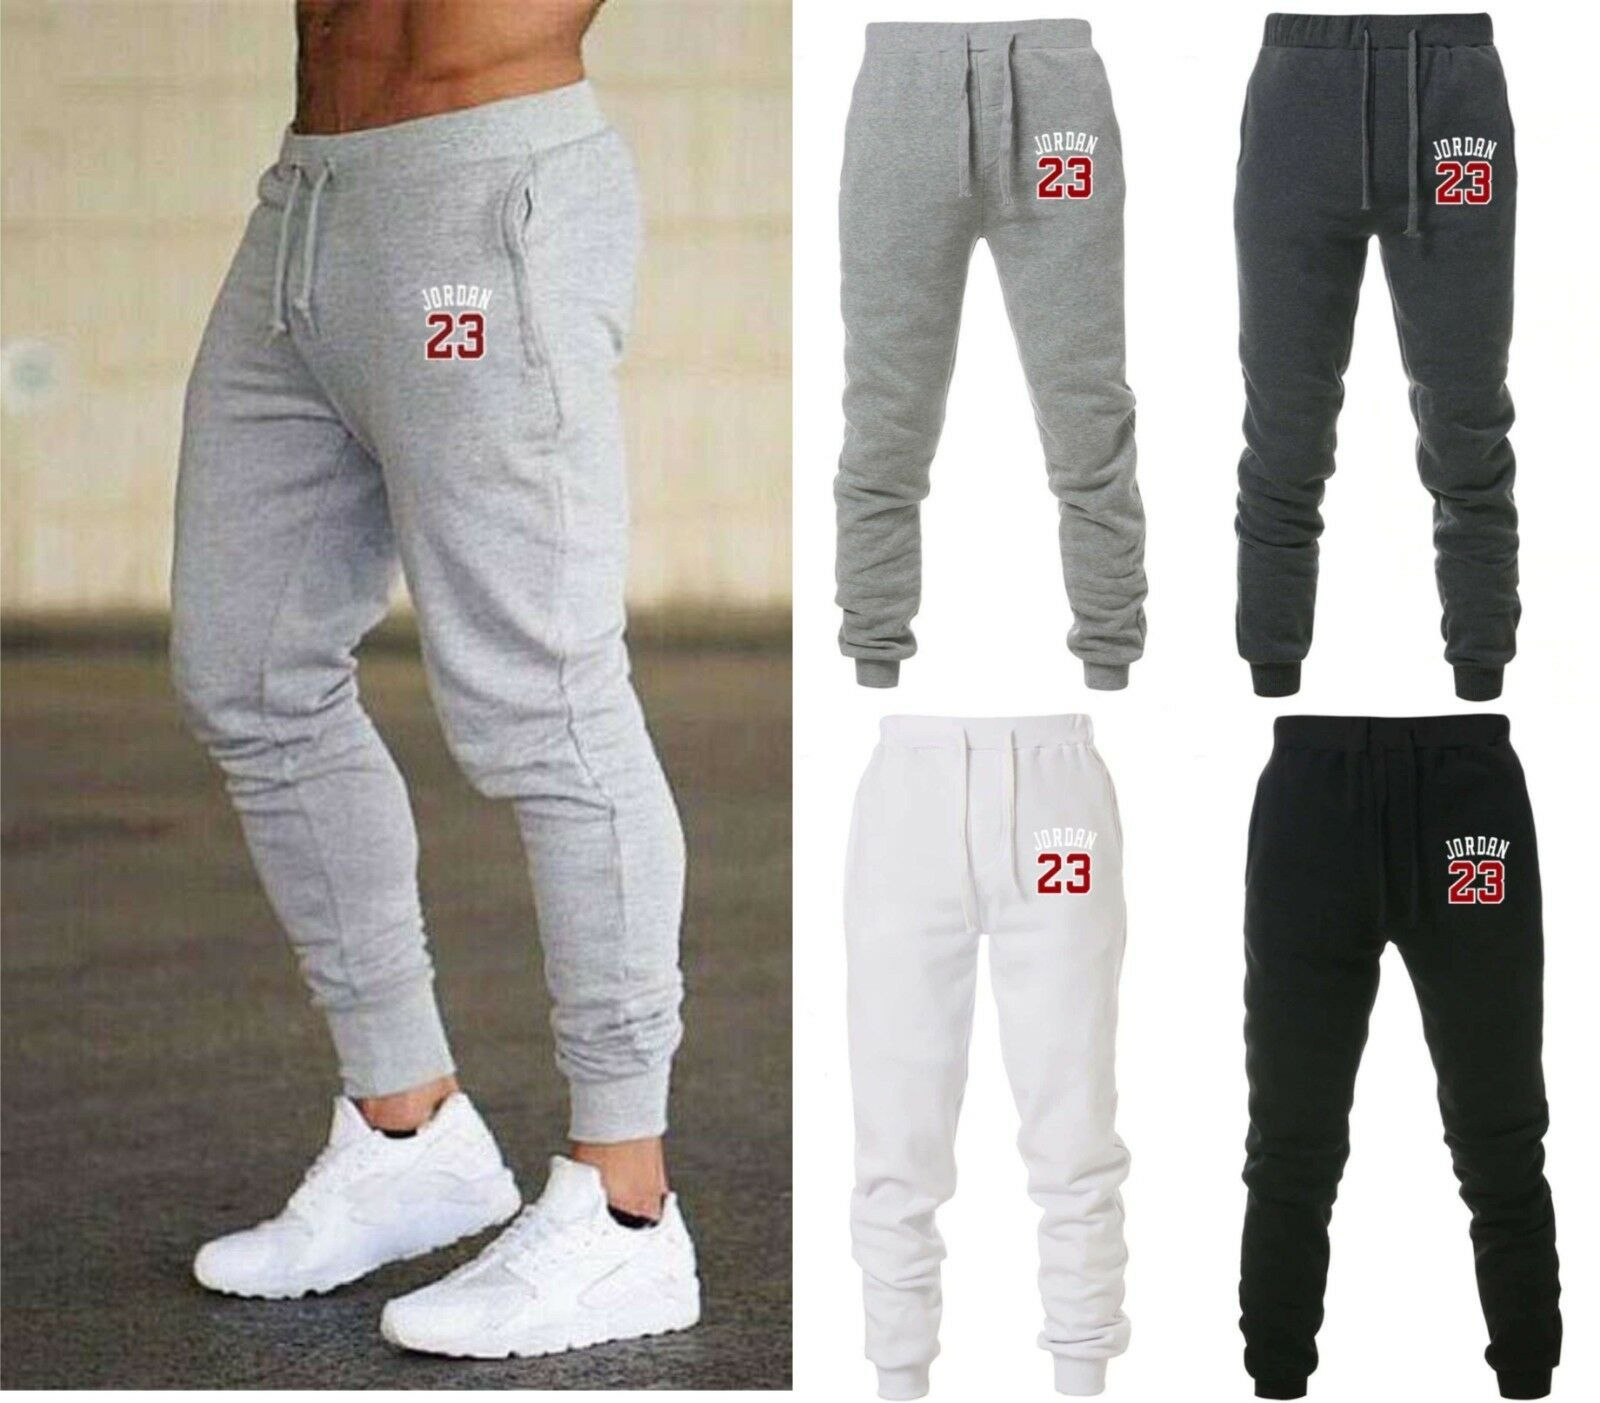 6fe96dfb743a8 NEW Mens Michael Air Legend 23 Jordan Pants Men Sportswear Joggers ...